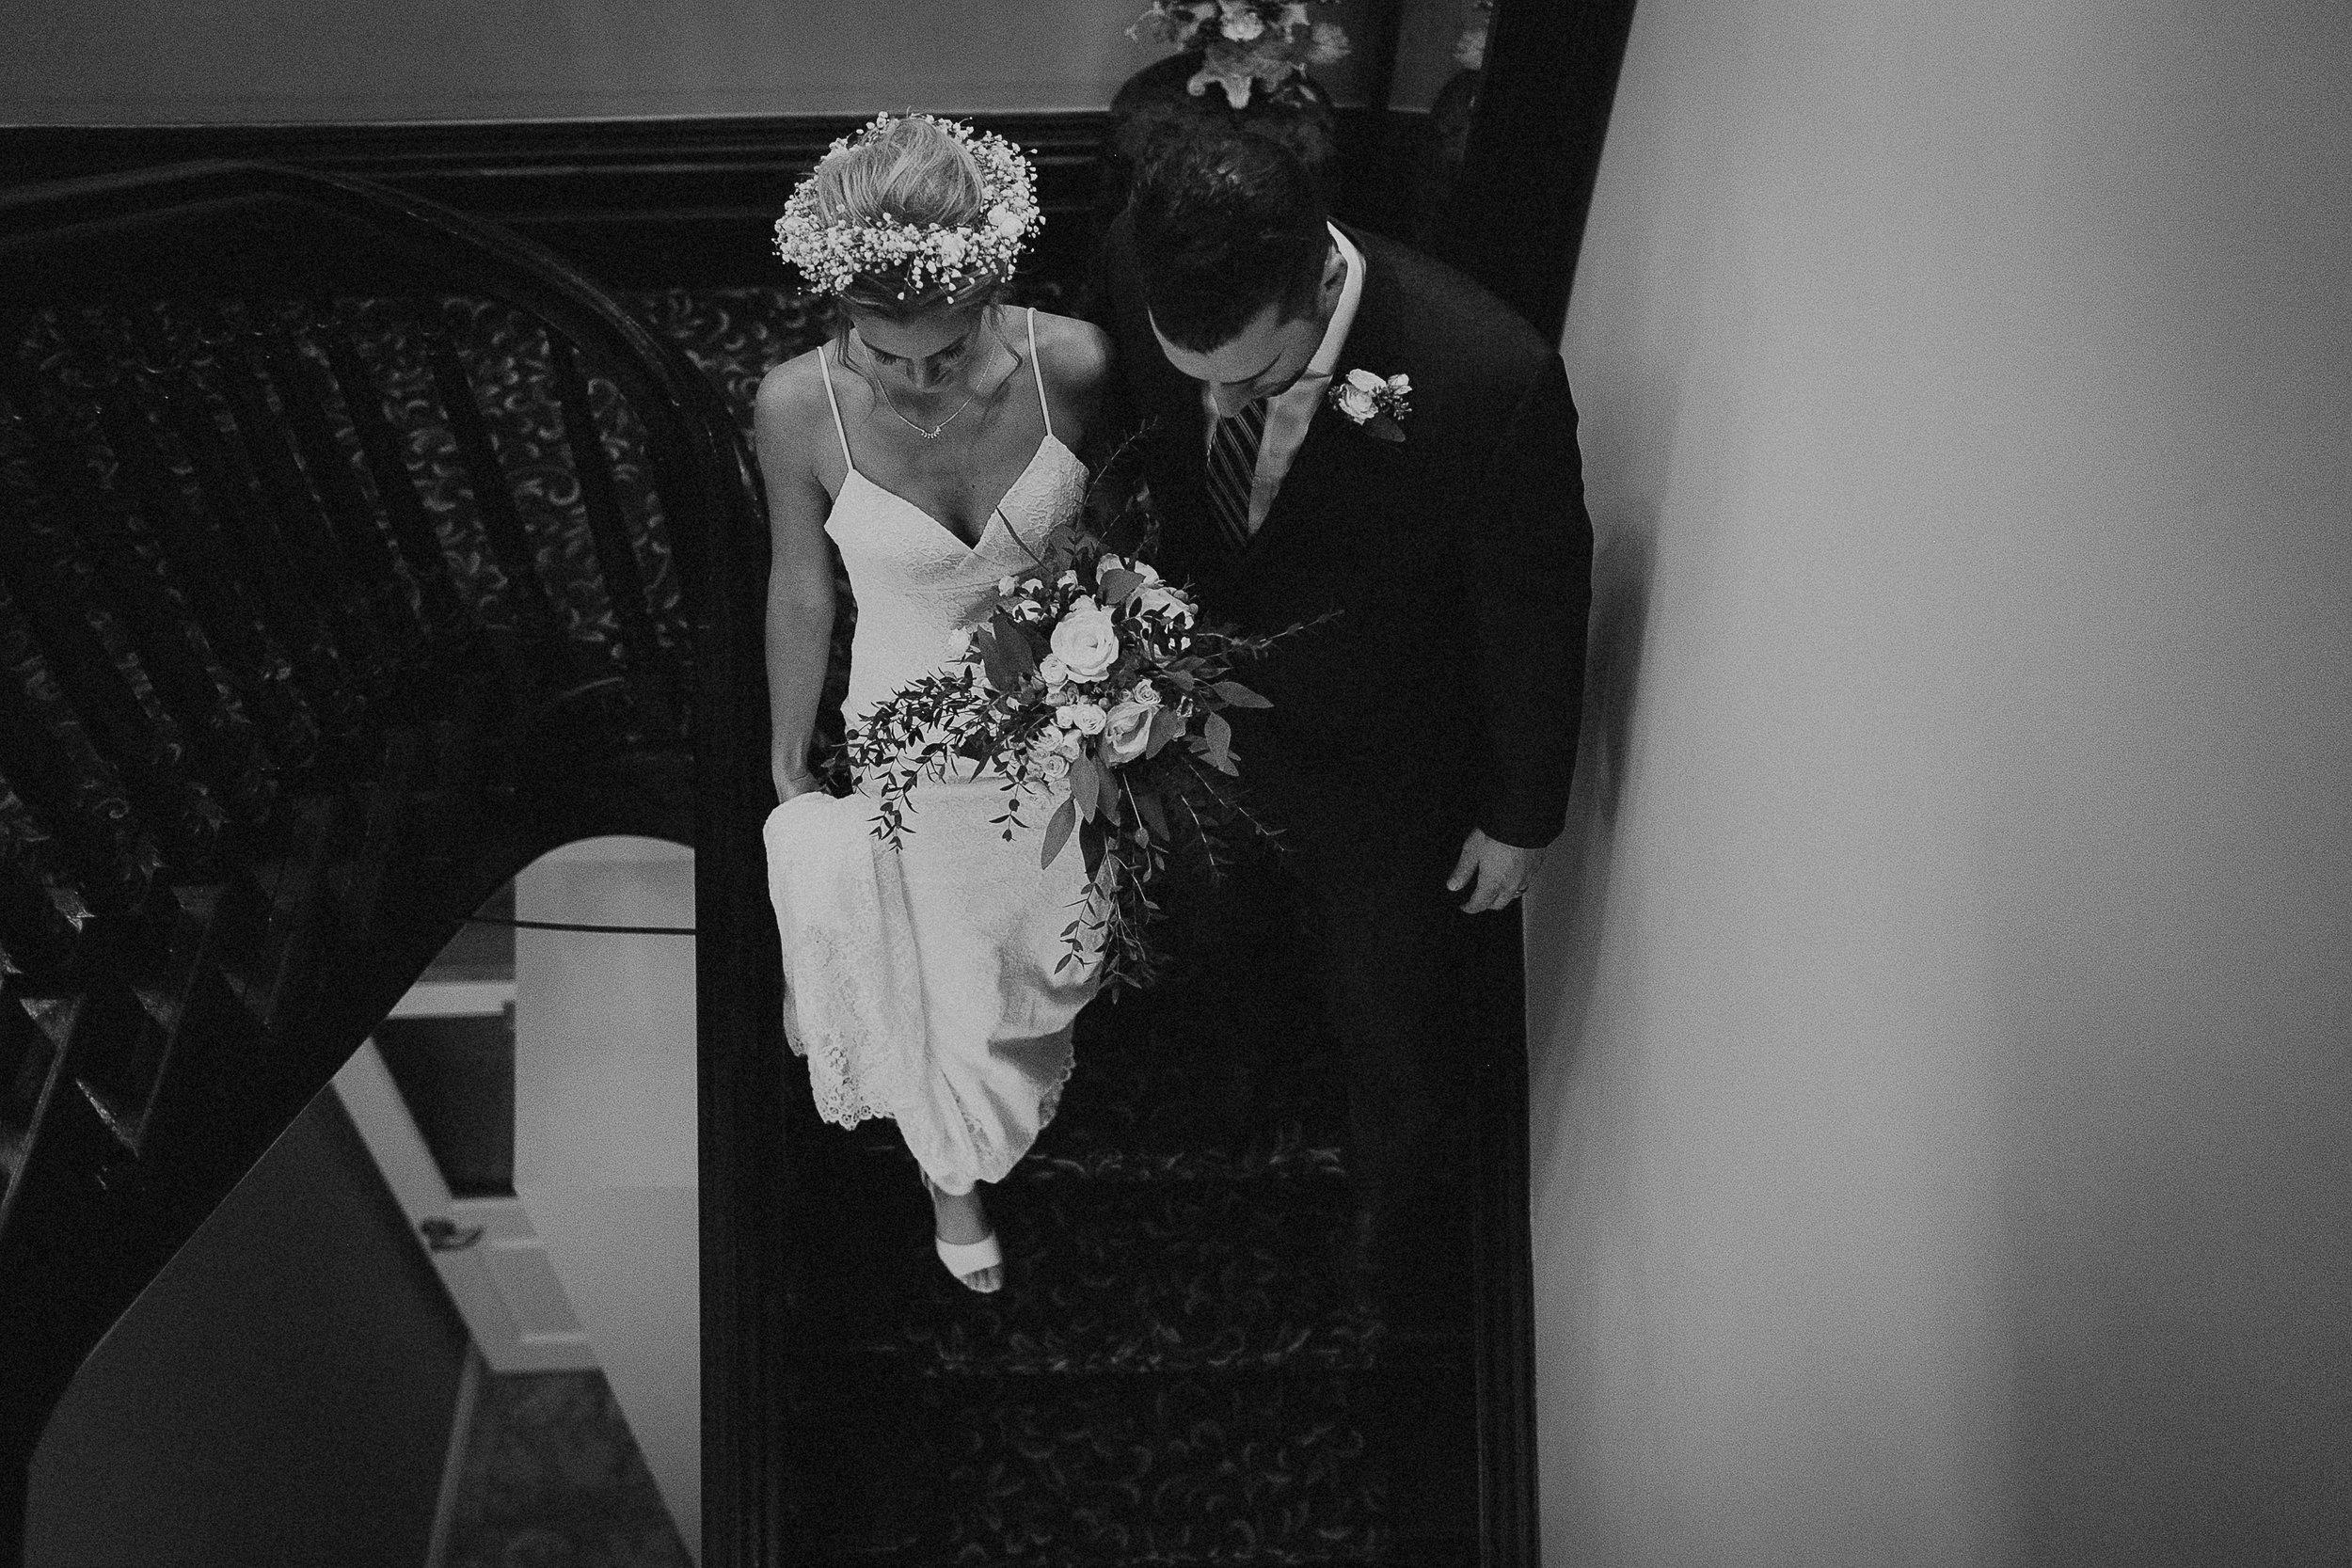 mark-and-liz-wedding-448.jpg